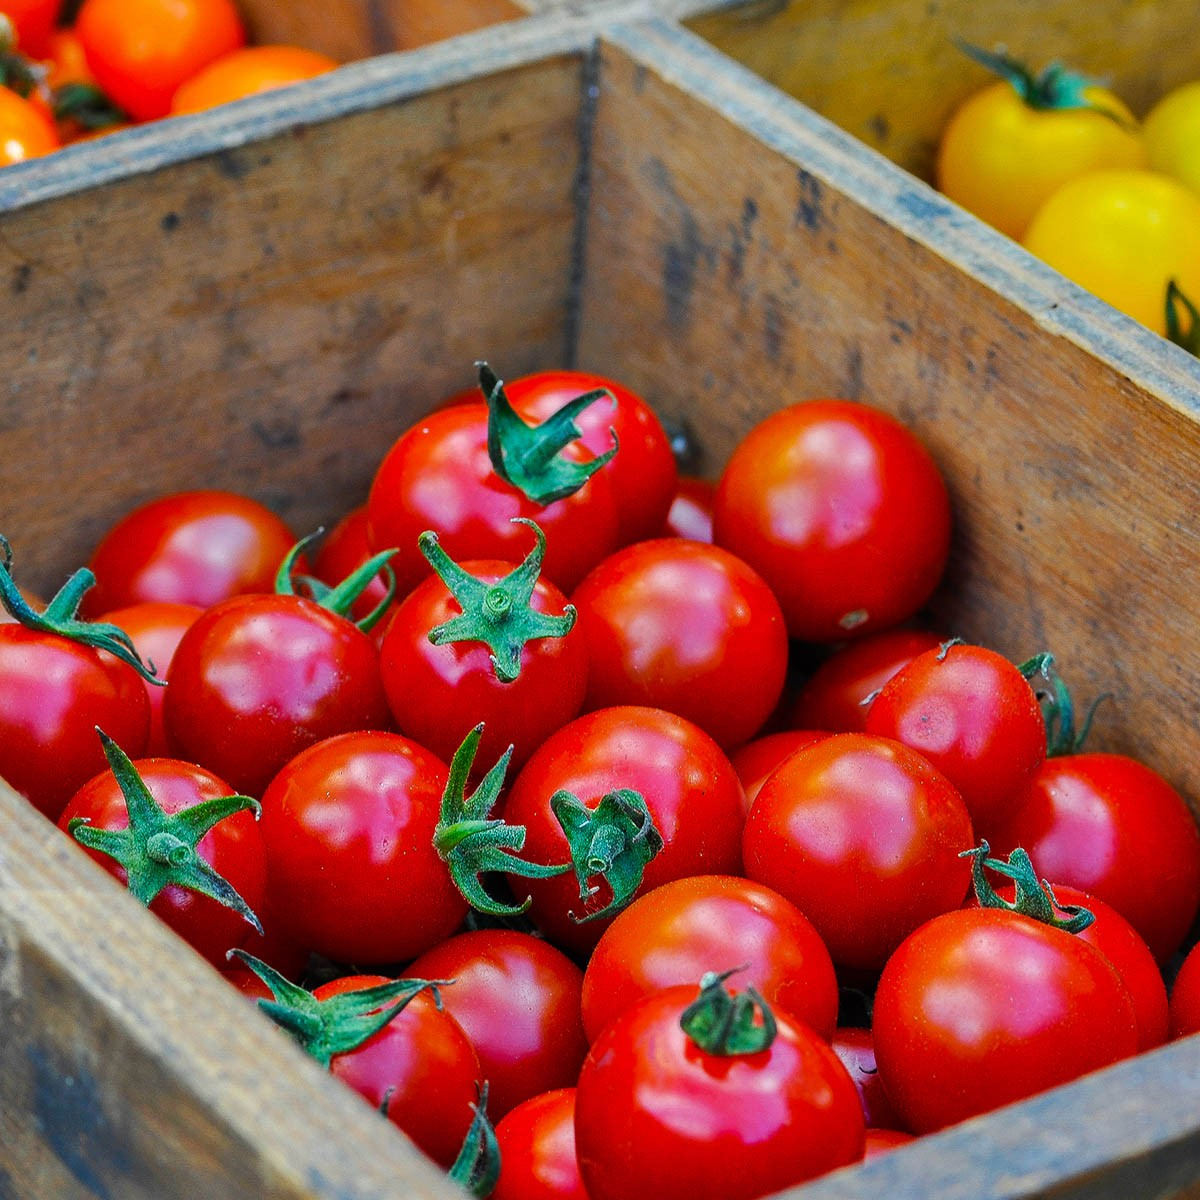 Tomate 'Solena Sweet Red' (veredelt) rote Nektar-Cherrytomate